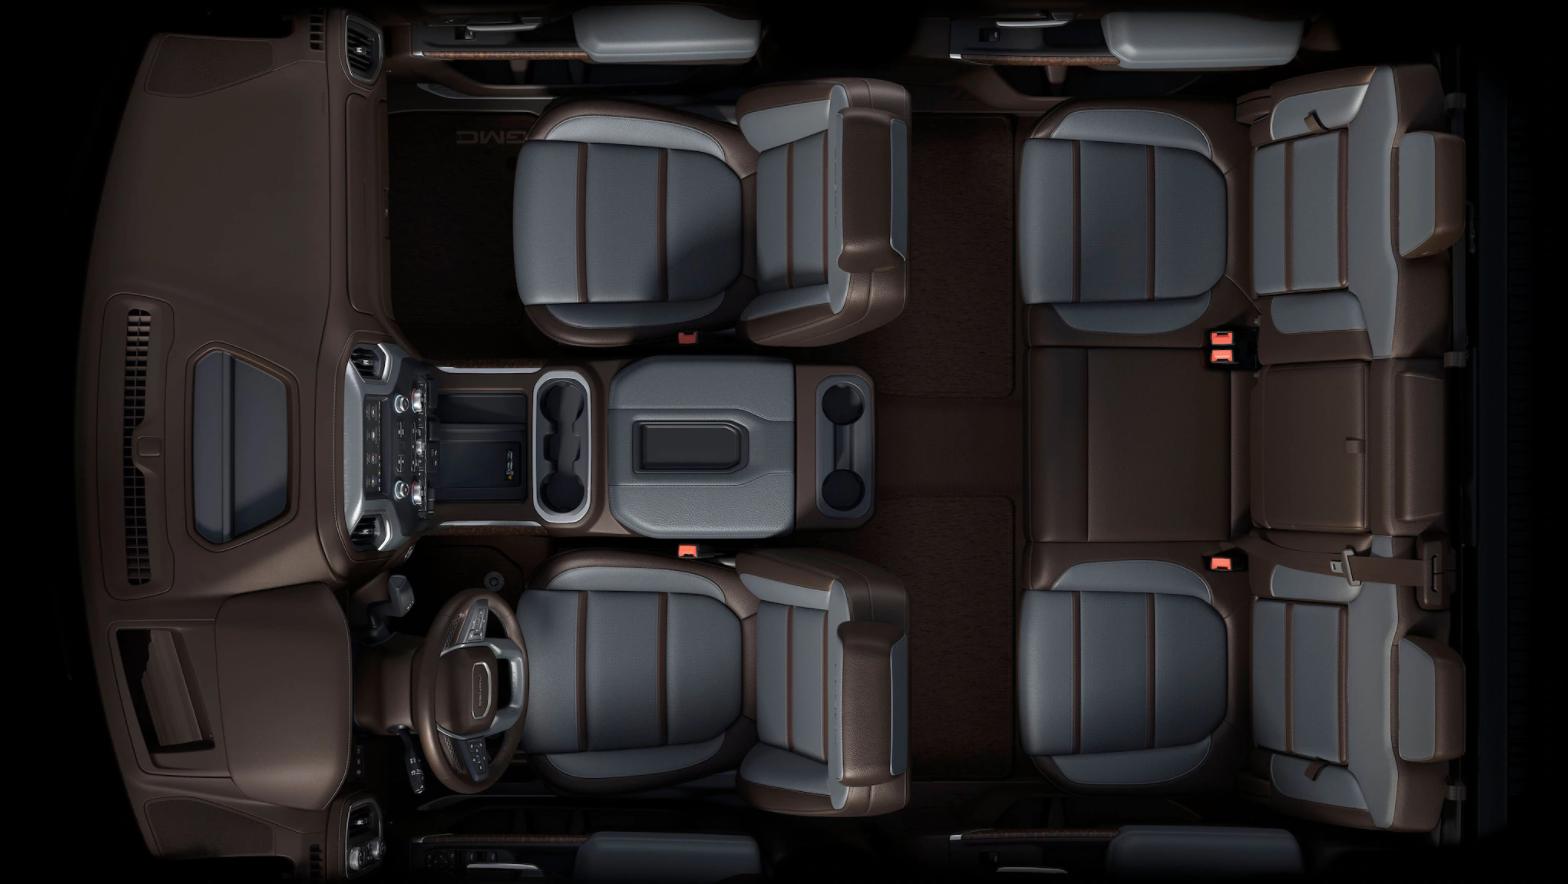 Bird's eye view of the 2020 GMC Sierra Truck interior